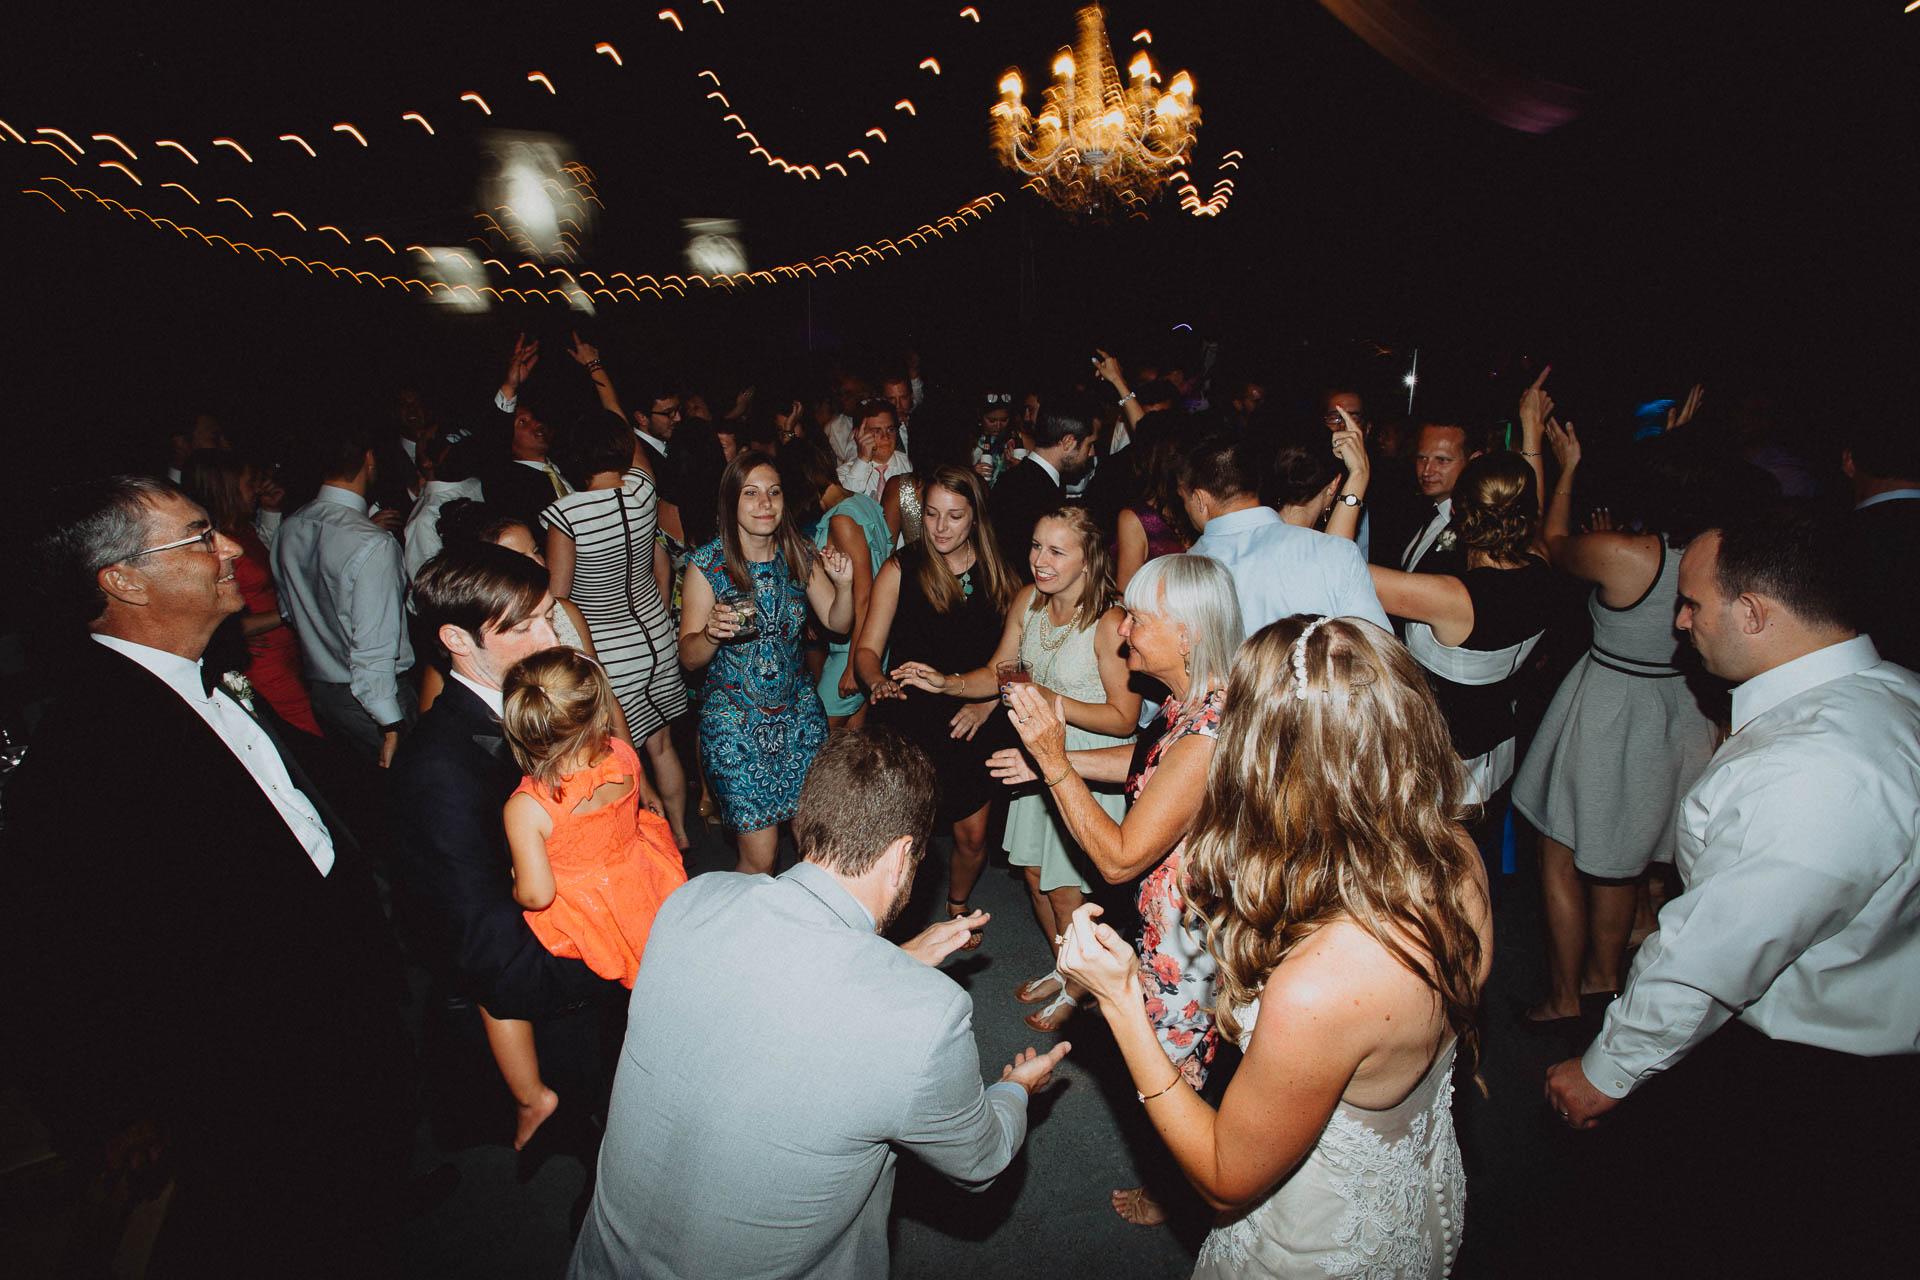 Keri-Joseph-Top-of-the-Market-Wedding-201@2x.jpg